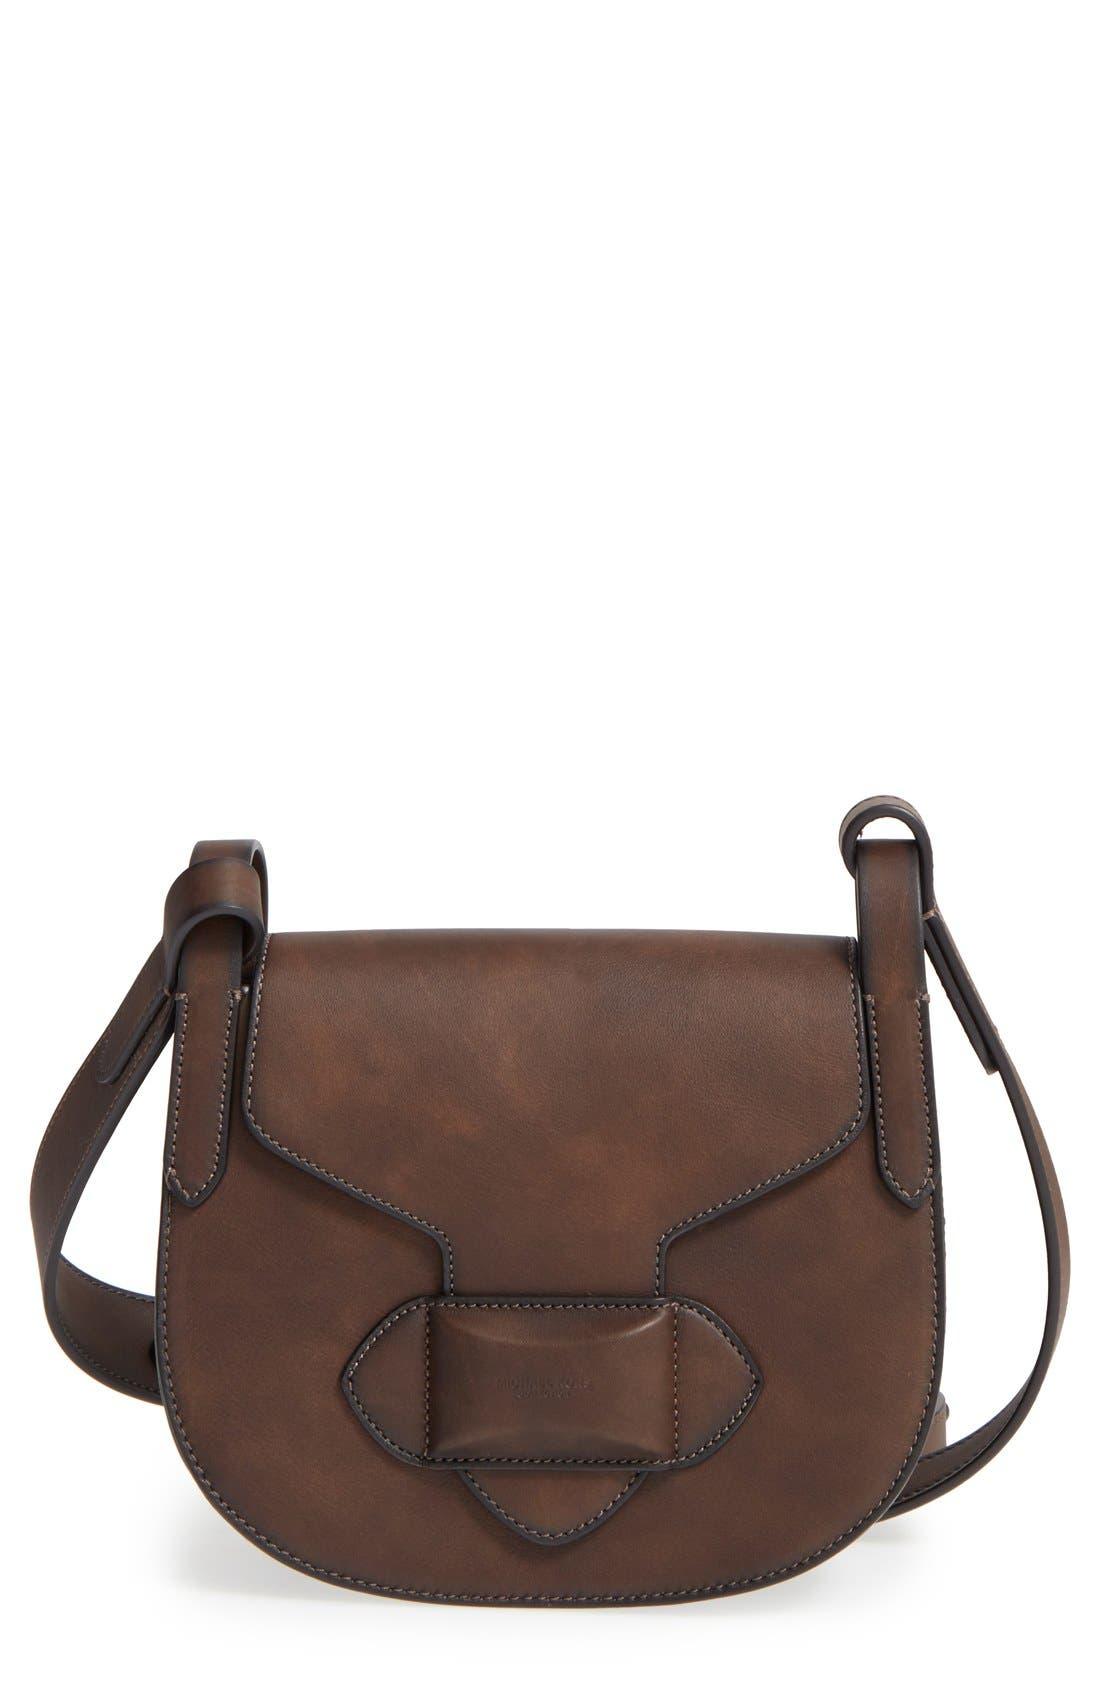 Michael Kors 'Daria' Leather Saddle Bag